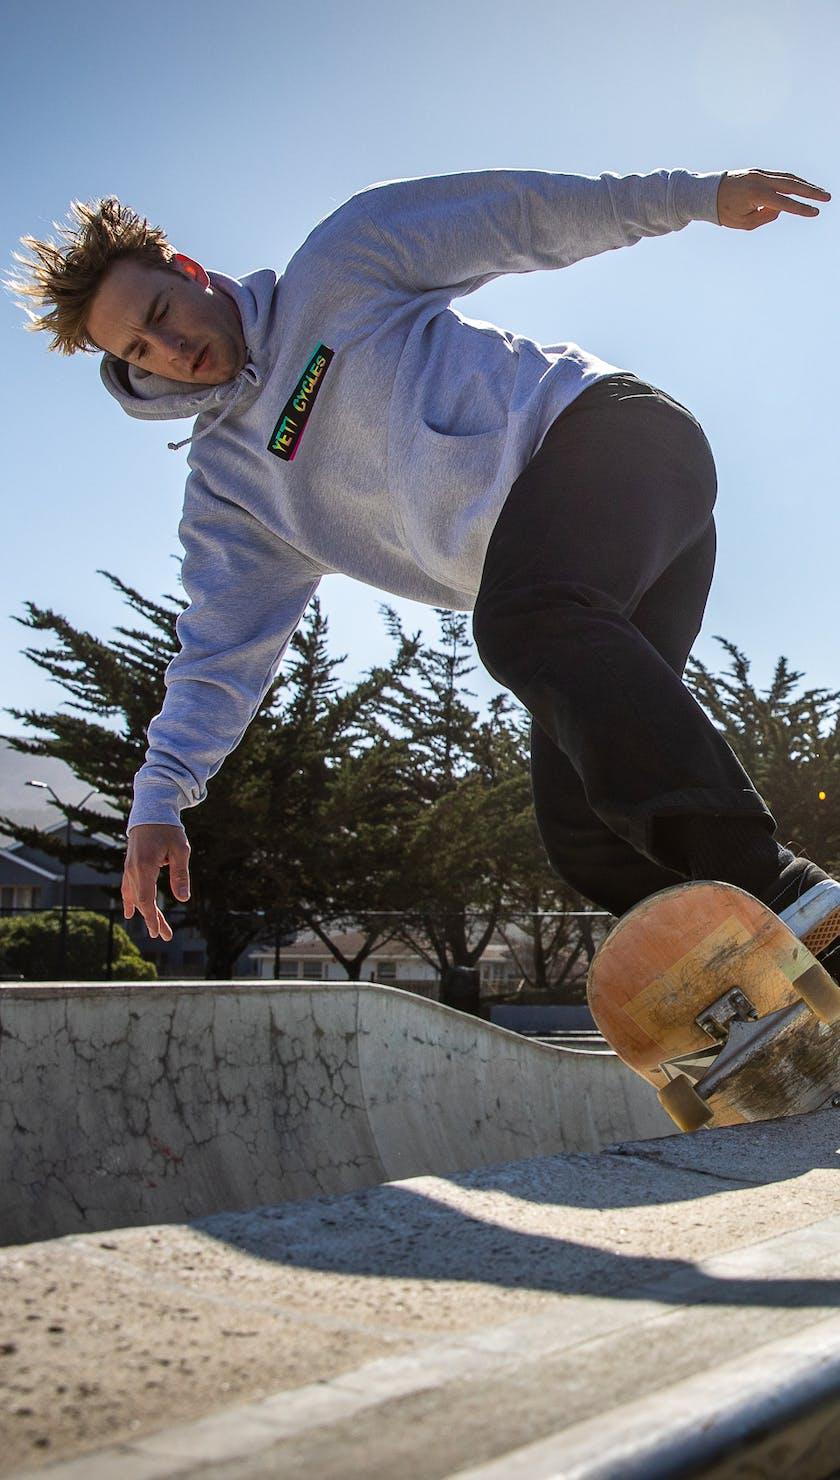 Warren Kniss skating the park